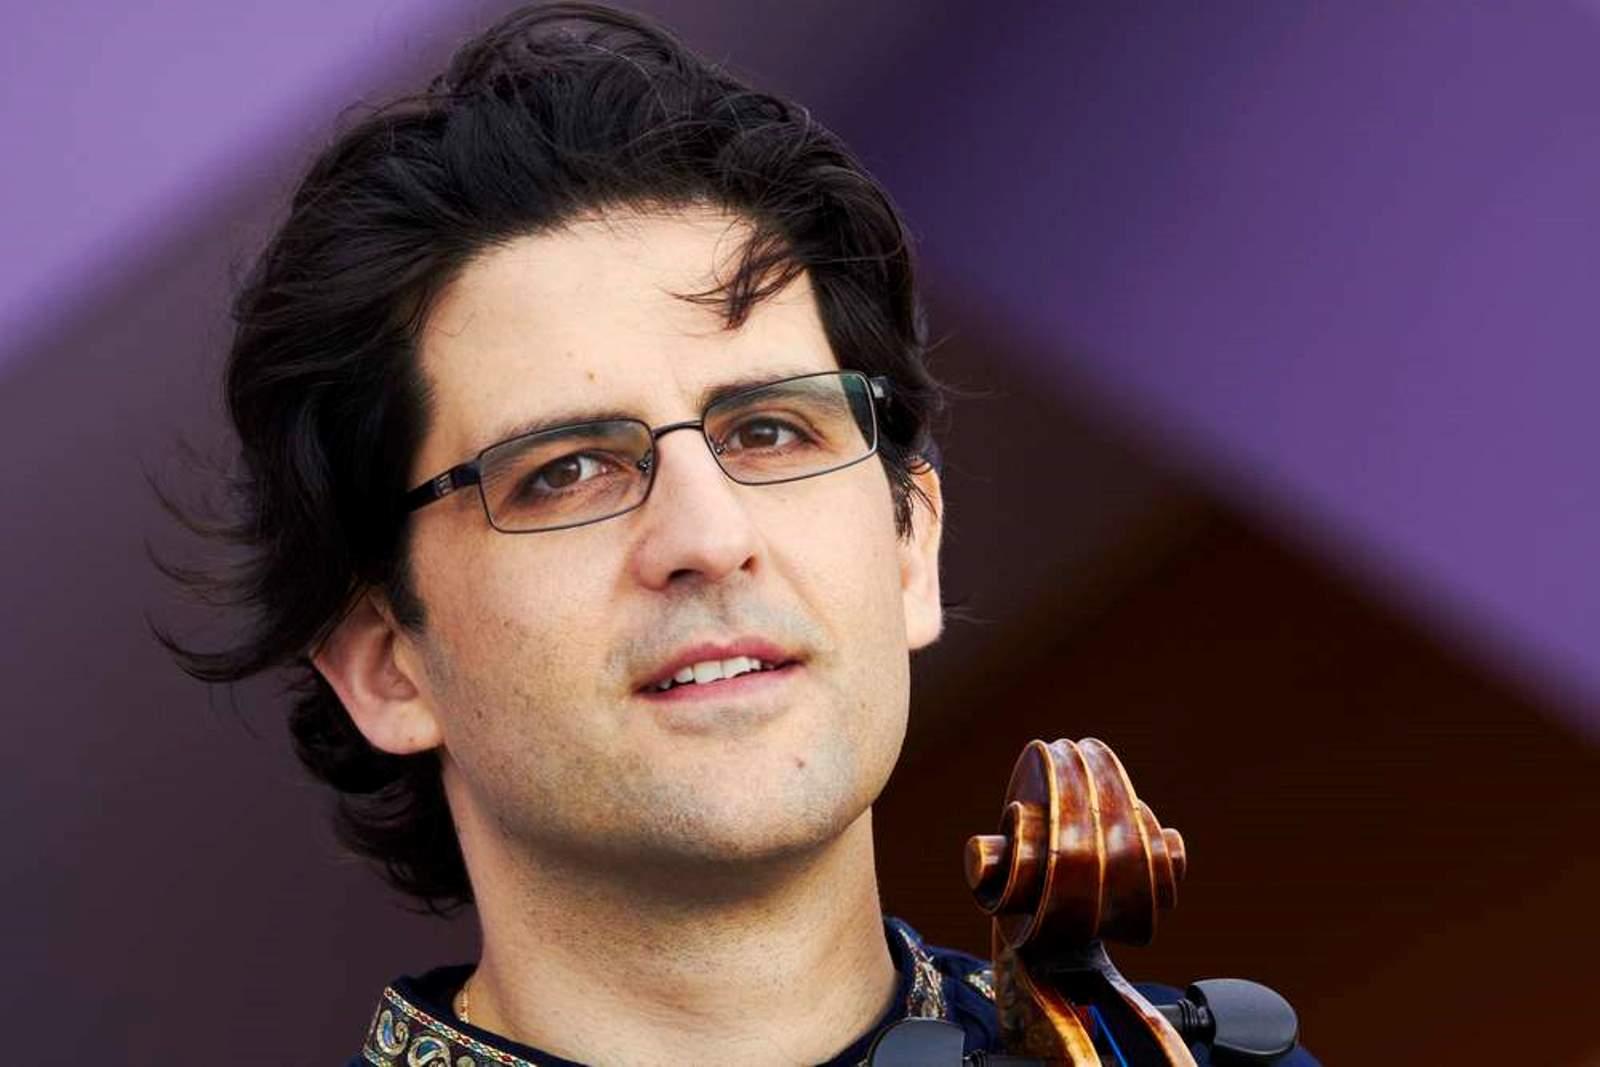 Photo of Amit Peled by Fabio Bidini.